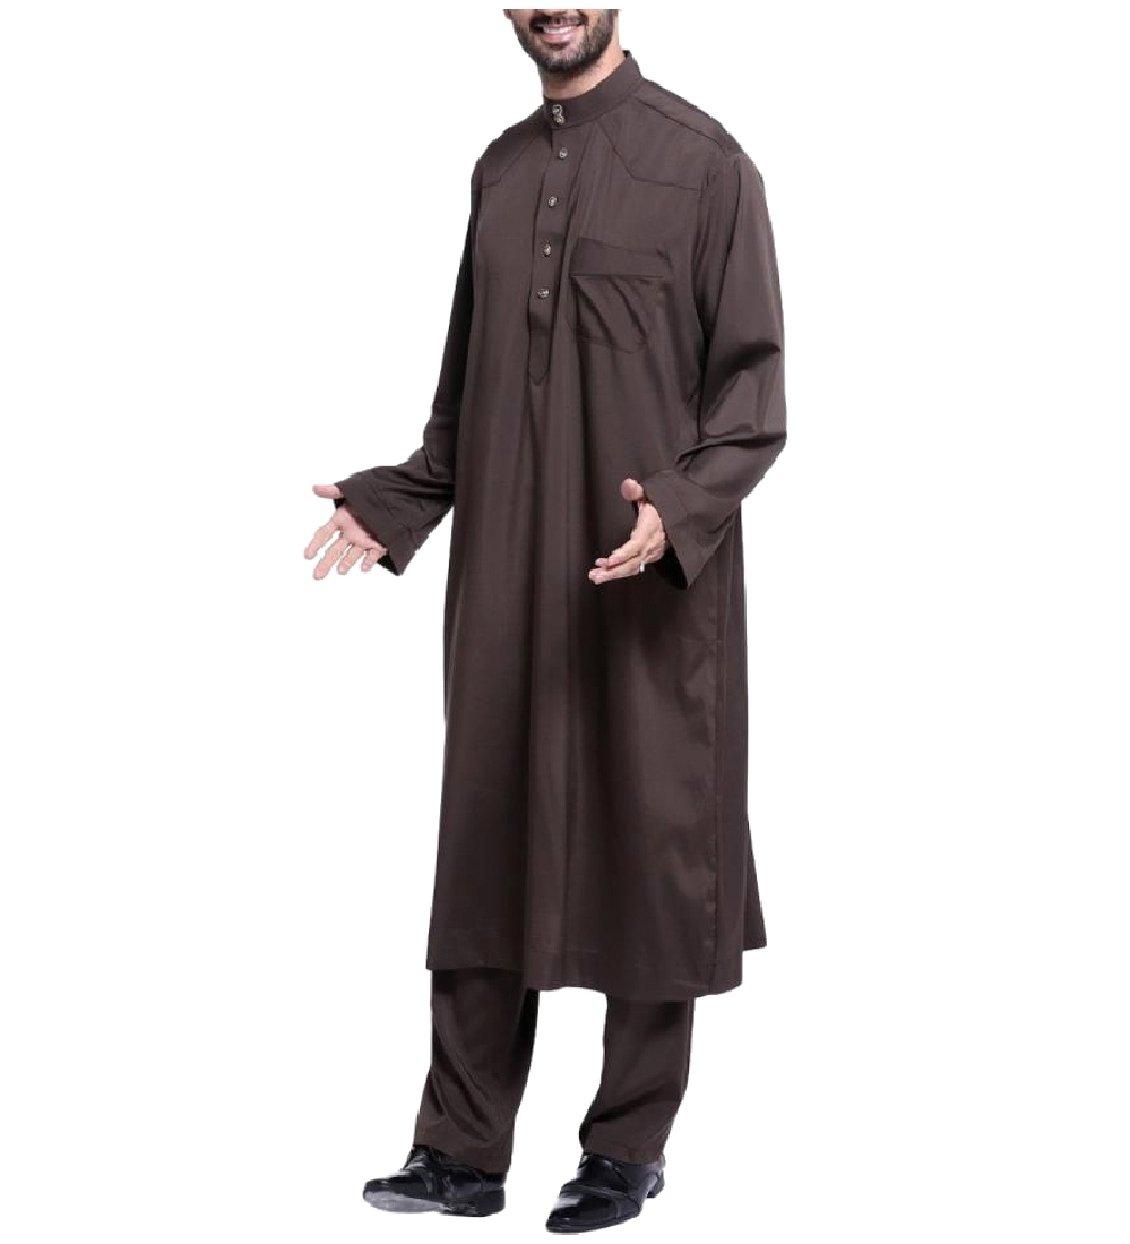 Abetteric Men Two Piece Pure Colour Middle East Muslim Salwar Suit Sets Coffee S